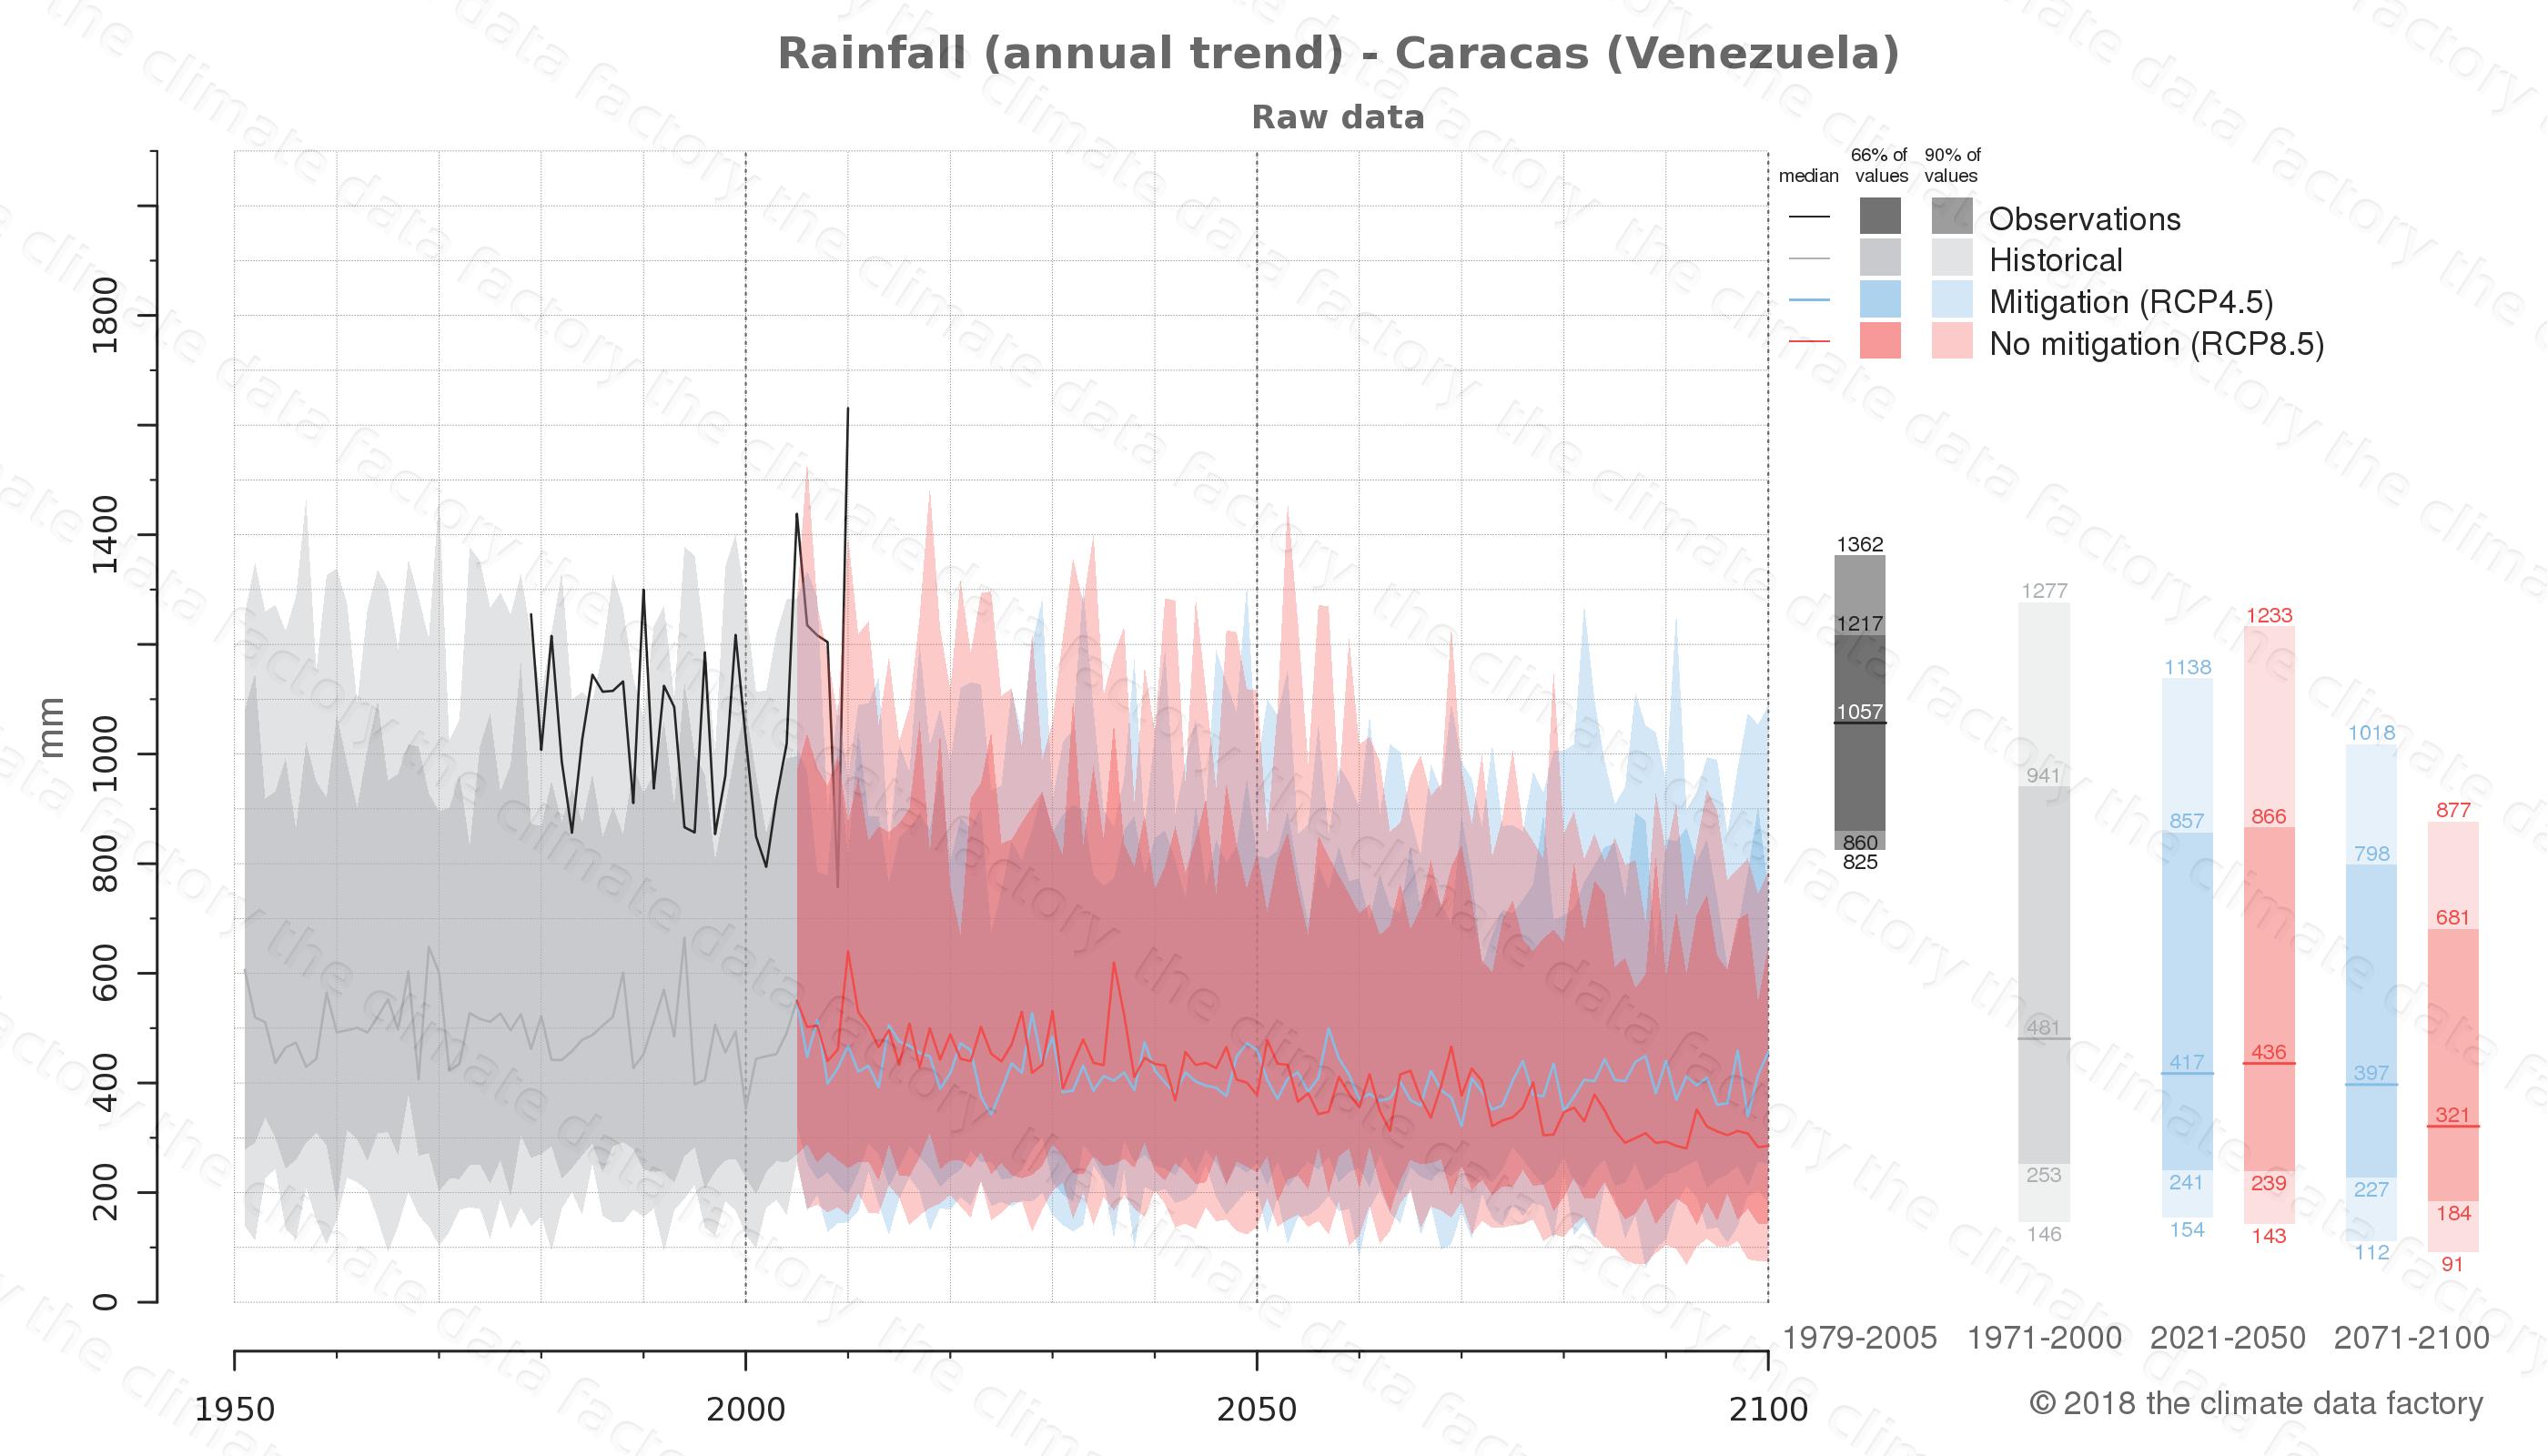 climate change data policy adaptation climate graph city data rainfall caracas venezuela